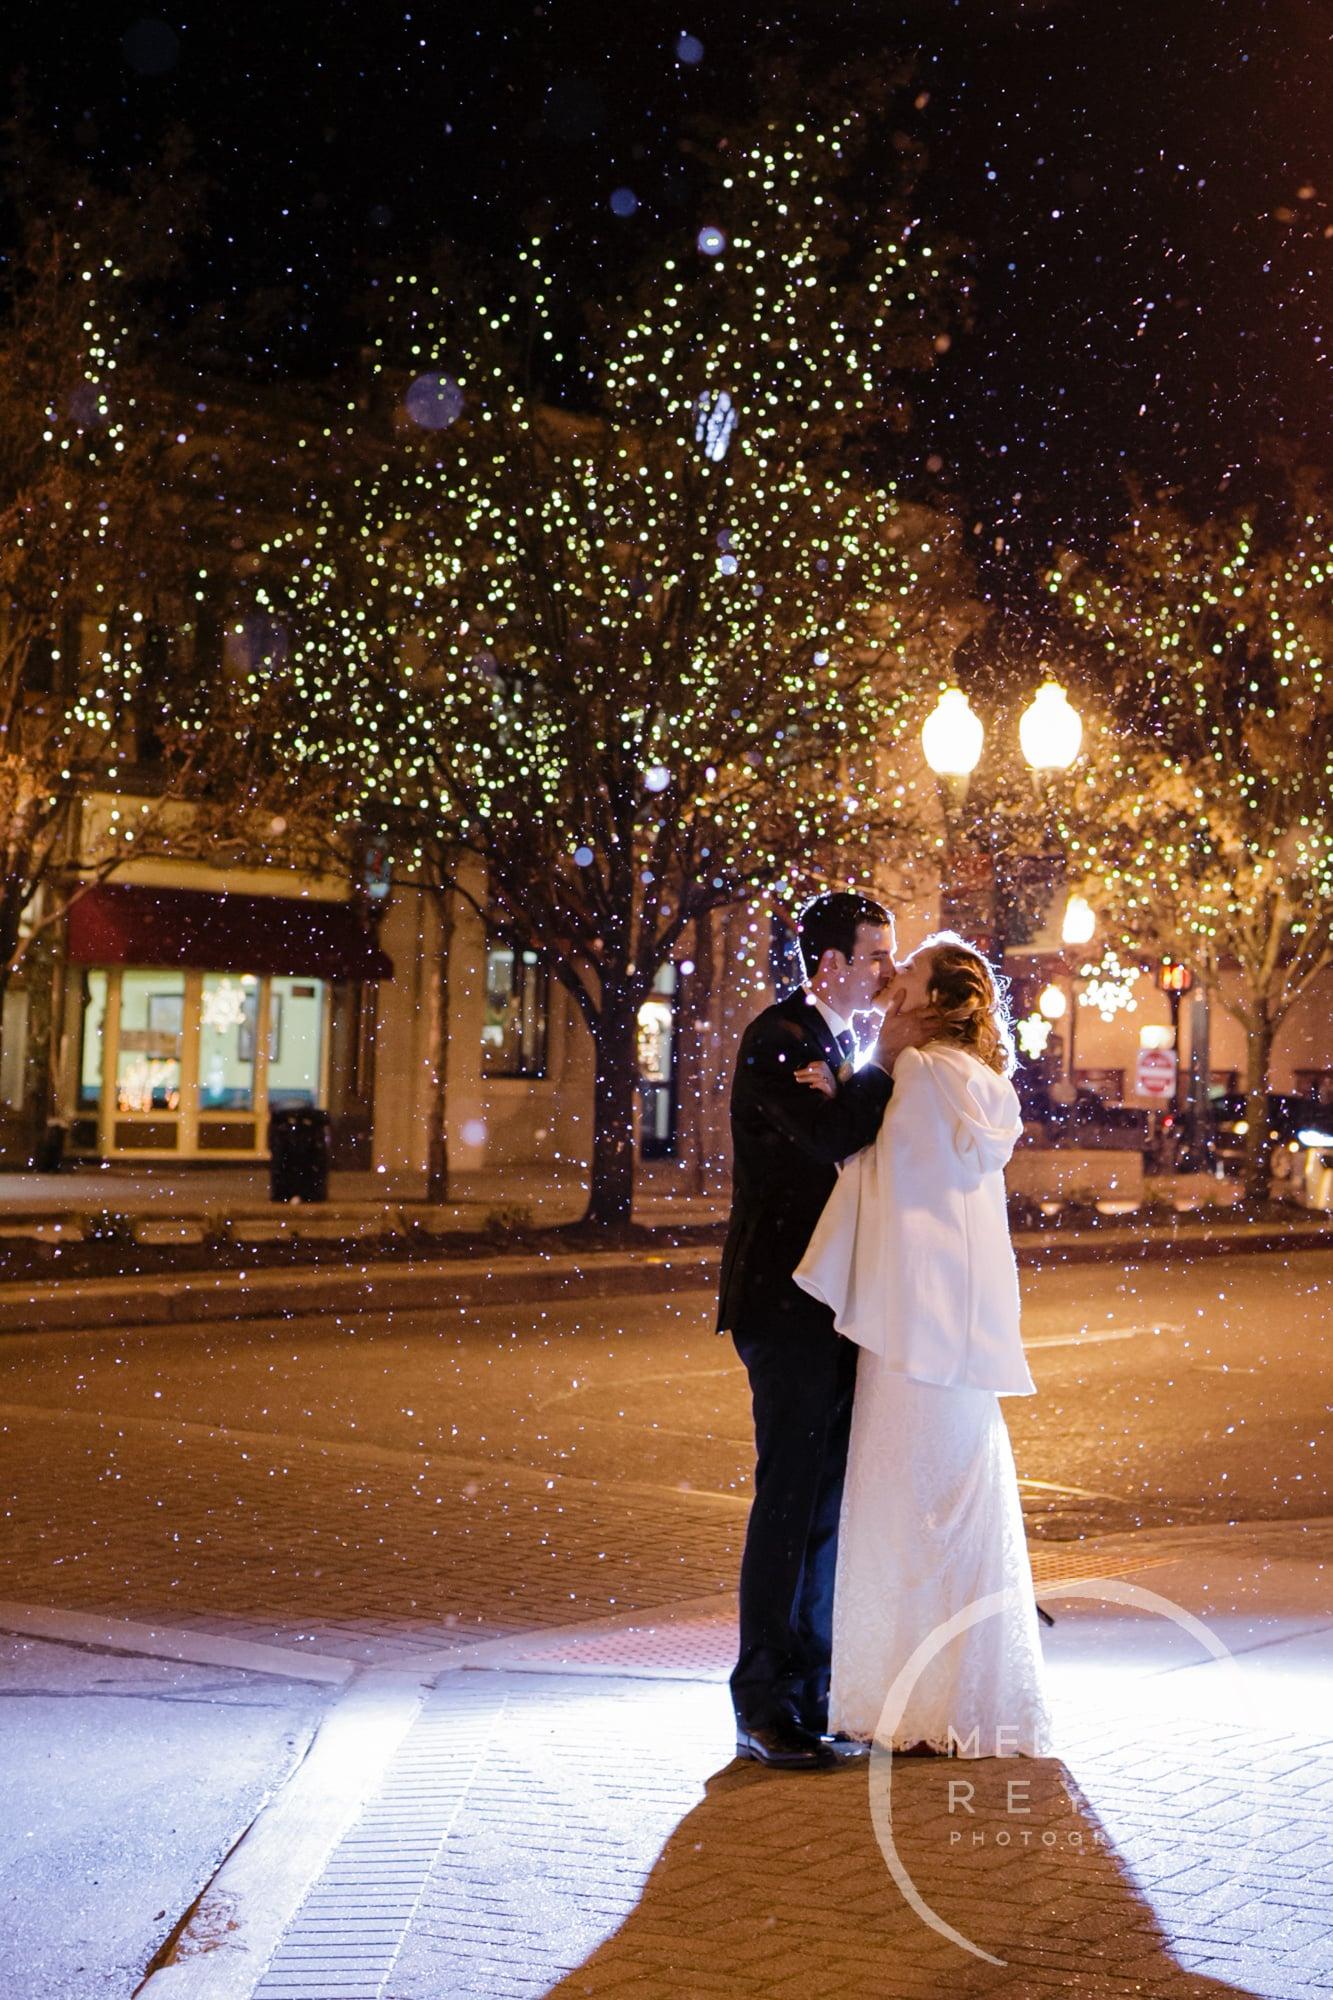 2015_ann_arbor_wedding_photographer_melaniereyes_067.JPG